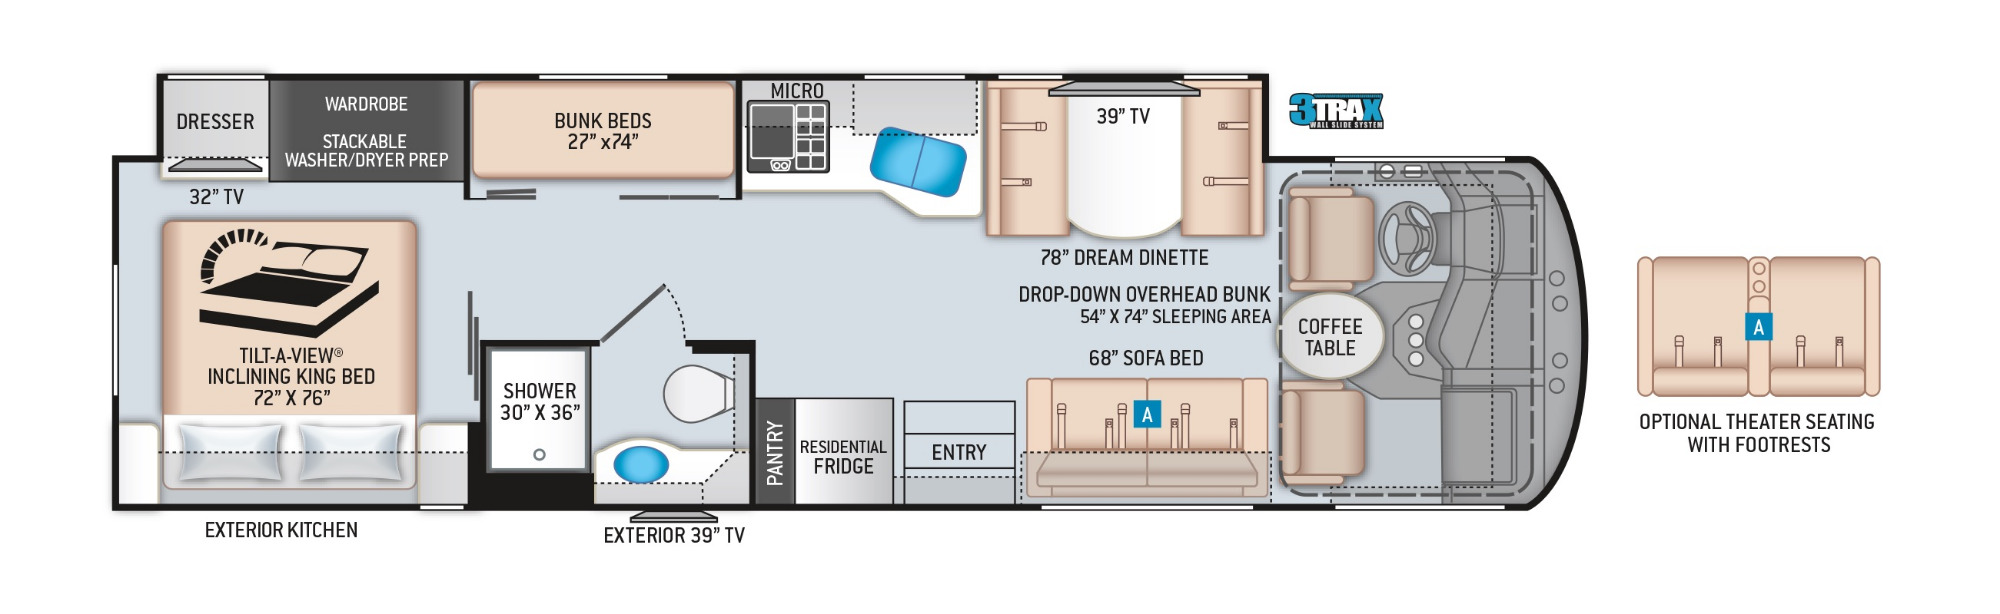 View Floor Plan for 2021 THOR MIRAMAR 34.6